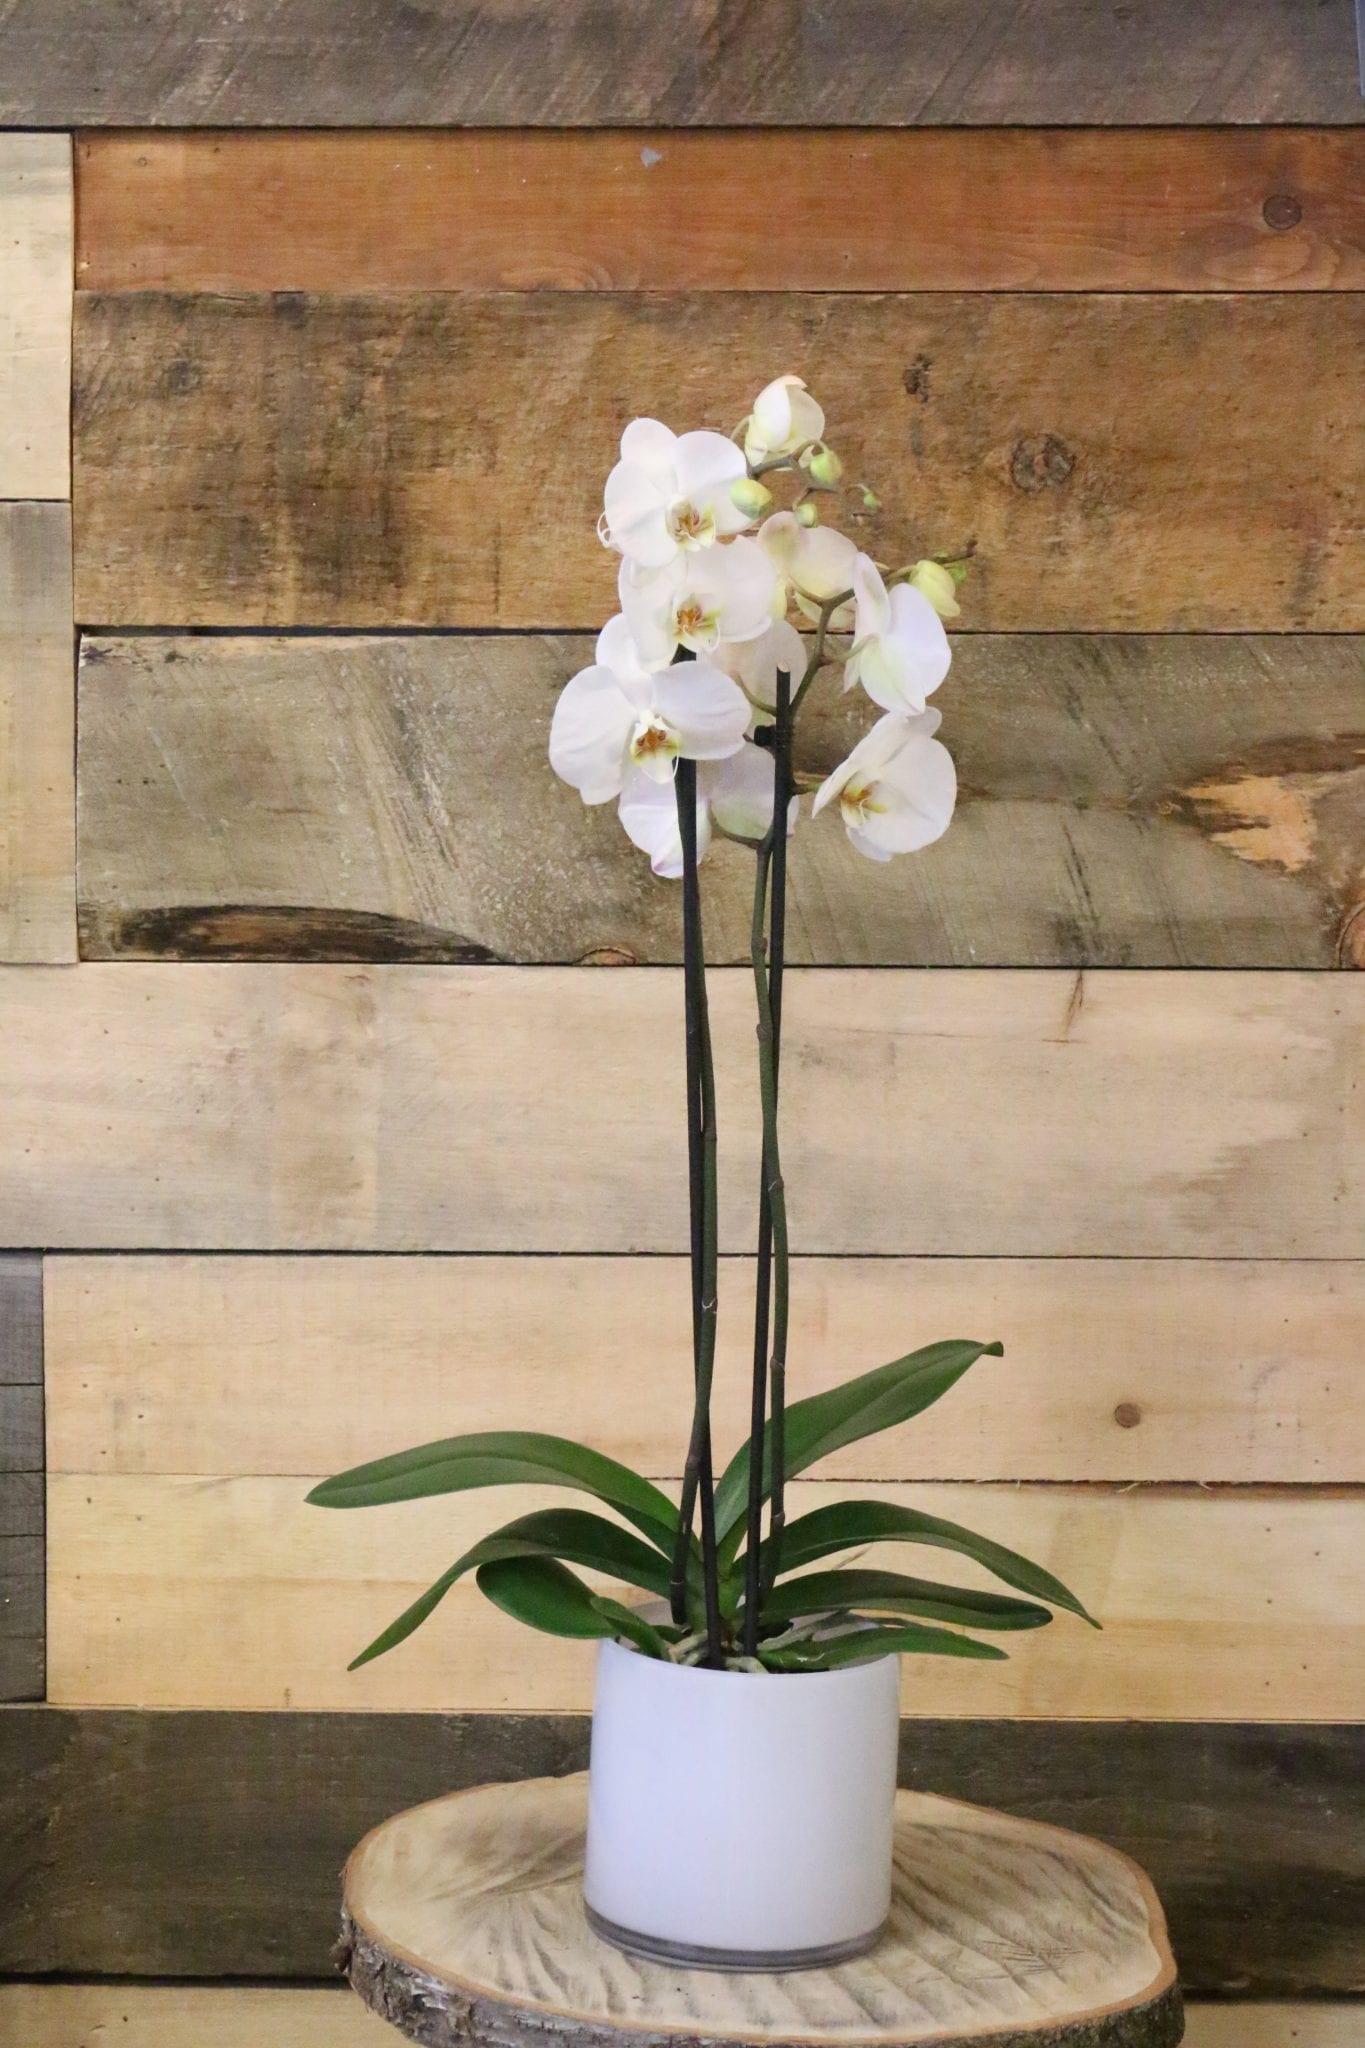 orchid e phalaenopsis 2 tiges fleuriste montr al le. Black Bedroom Furniture Sets. Home Design Ideas